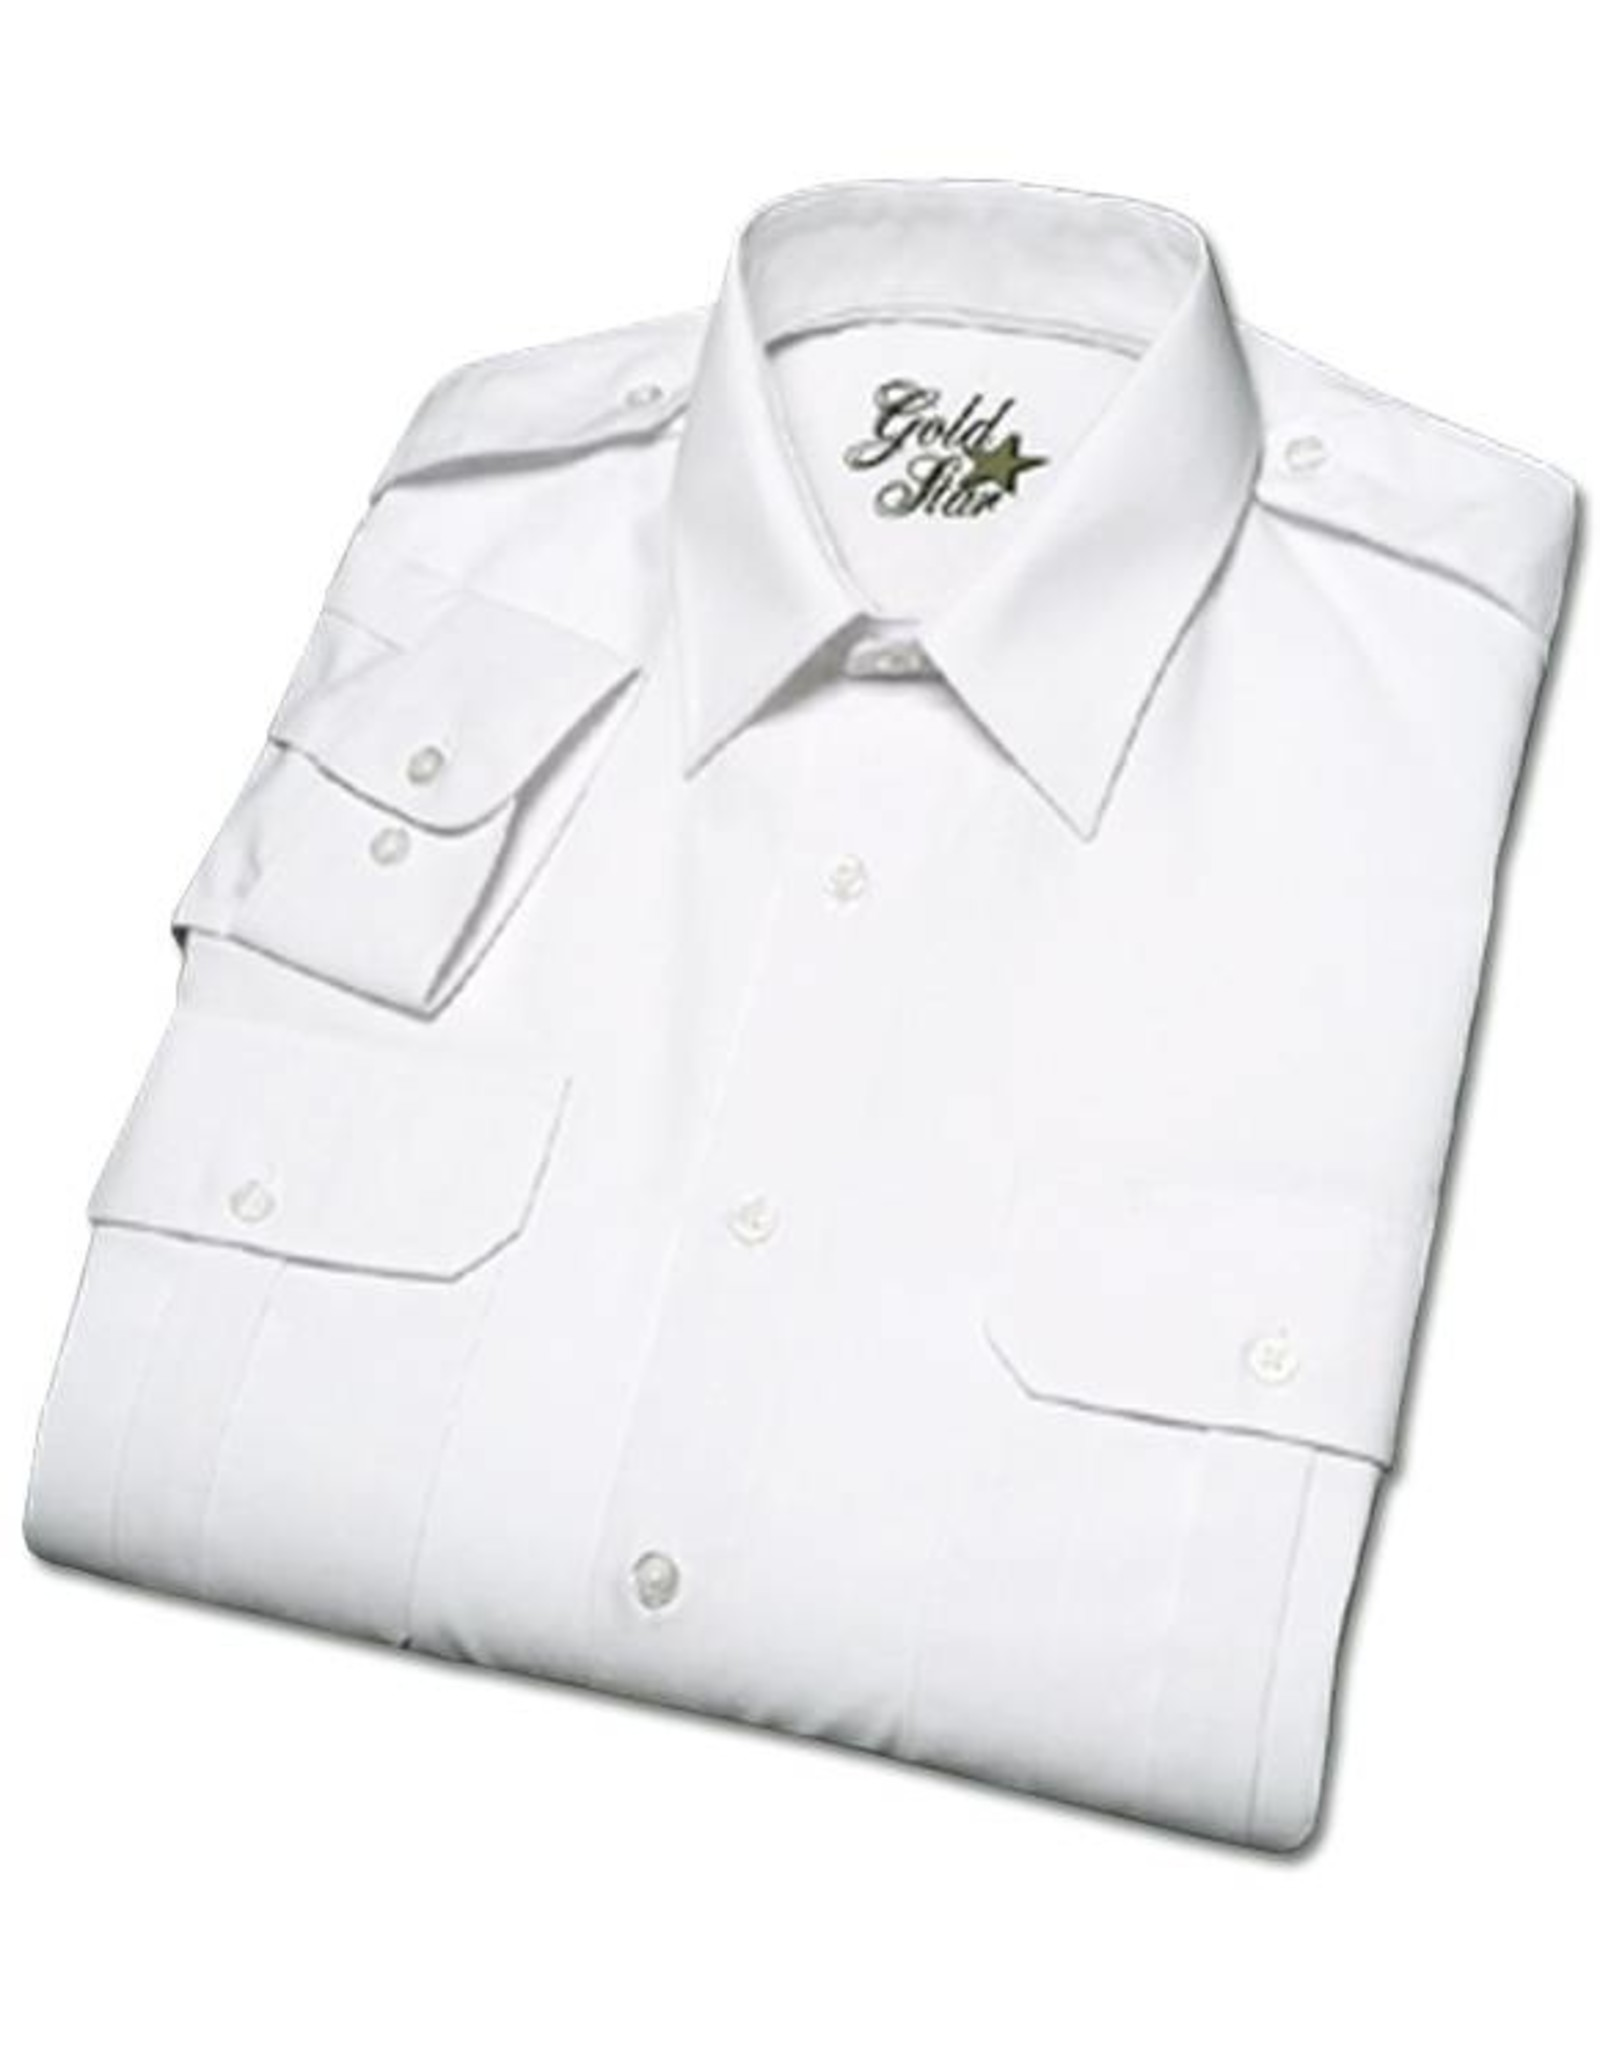 GoldStar Short Sleeve Ladies